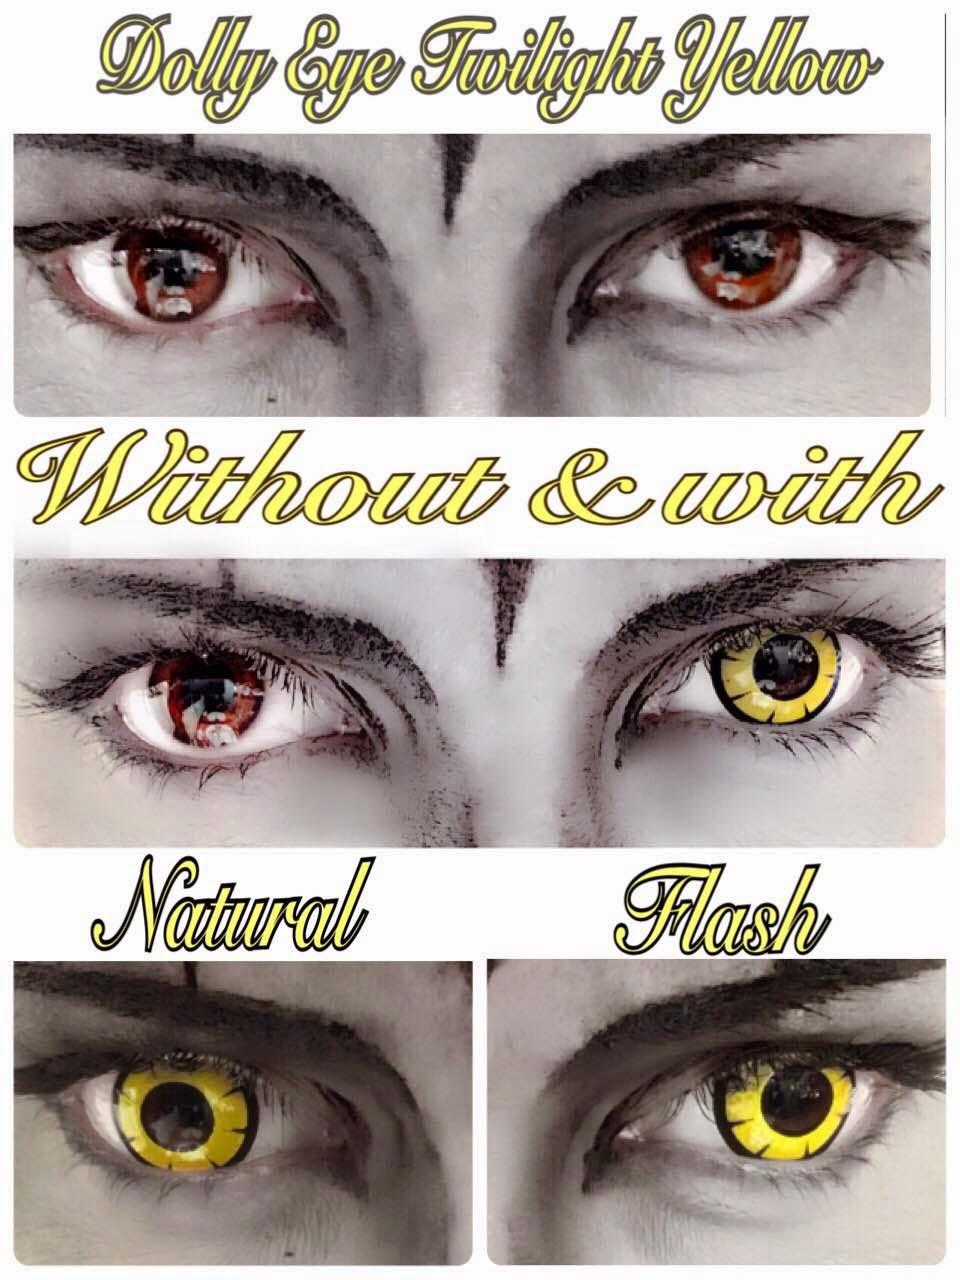 Dolly Eye Twilight Yellow